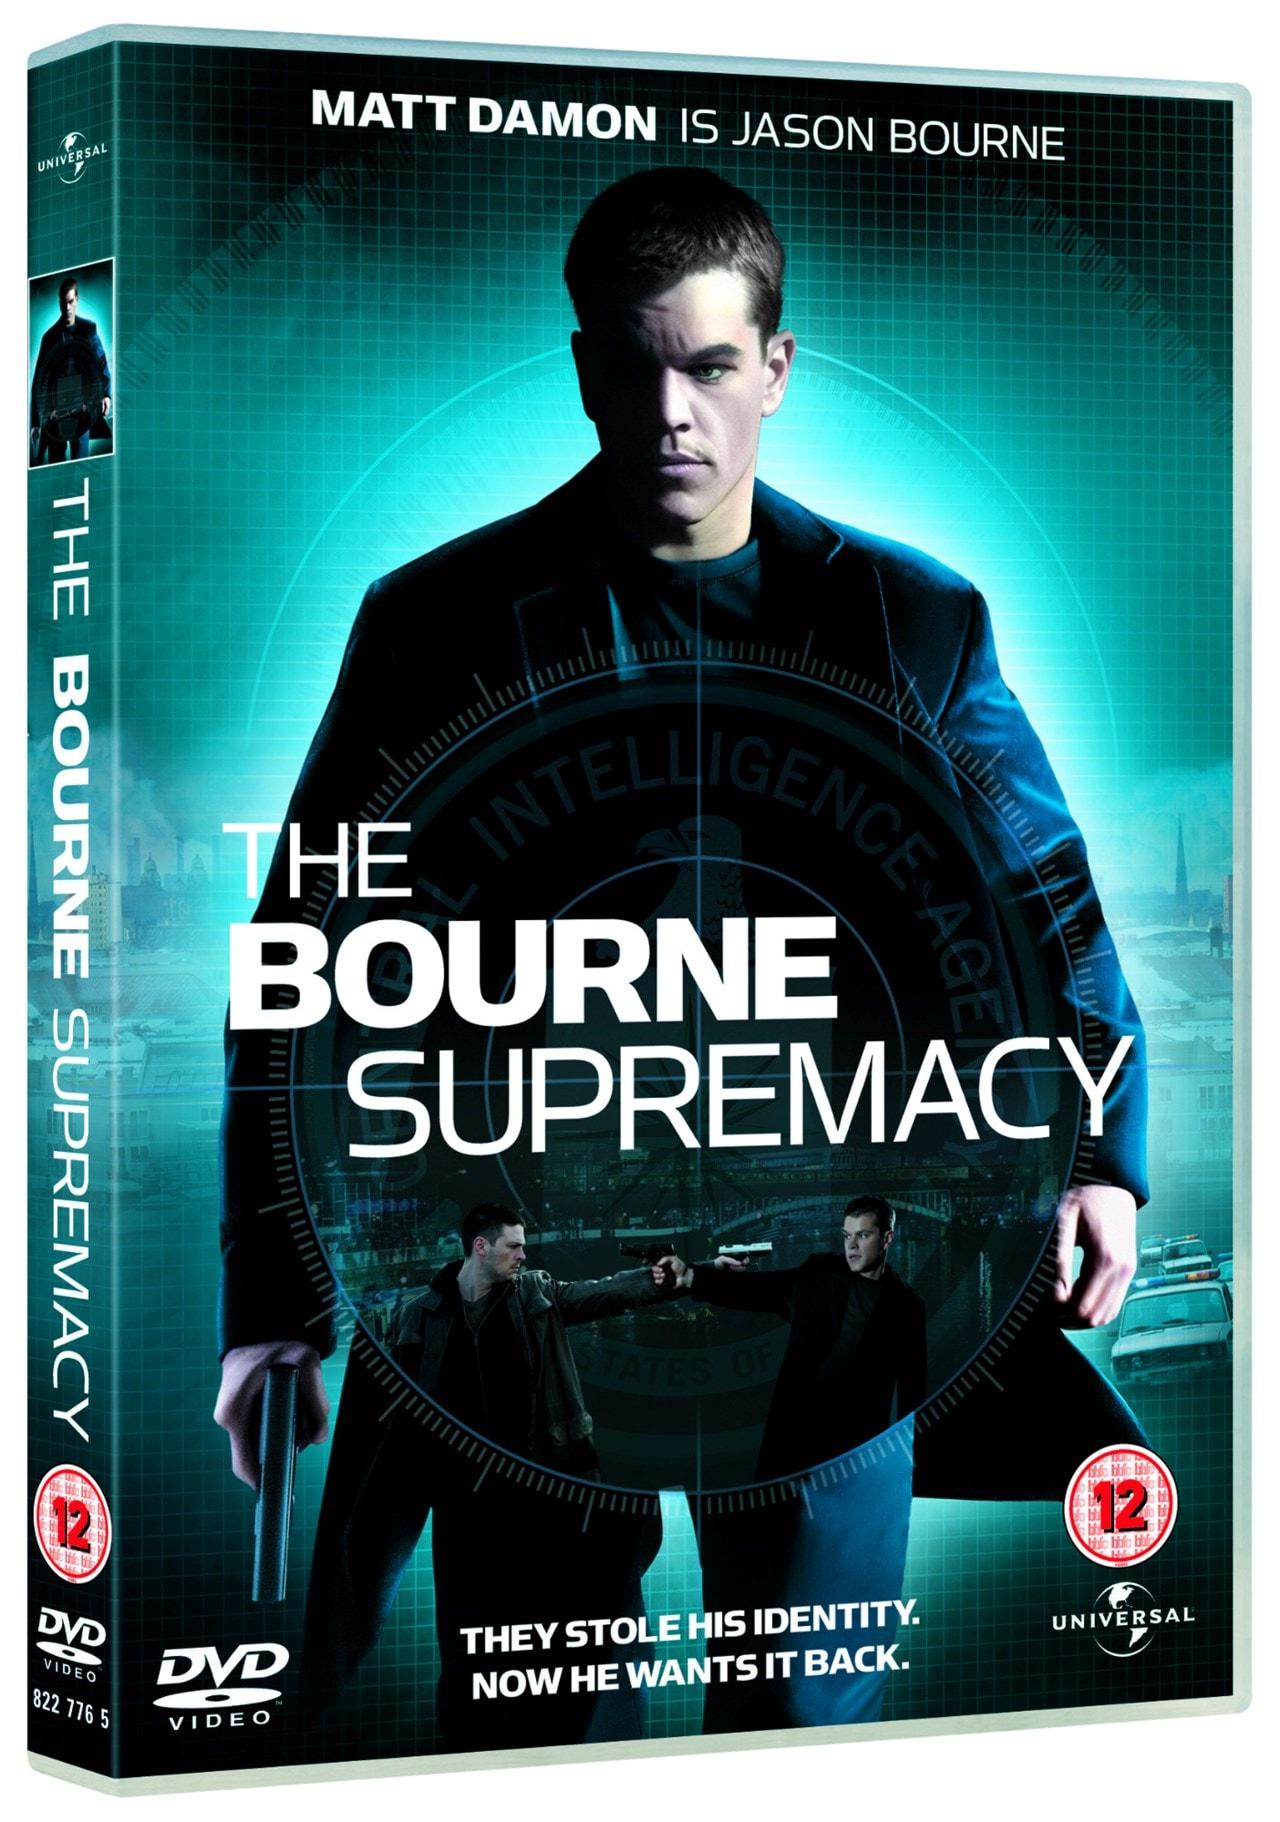 The Bourne Supremacy - 2